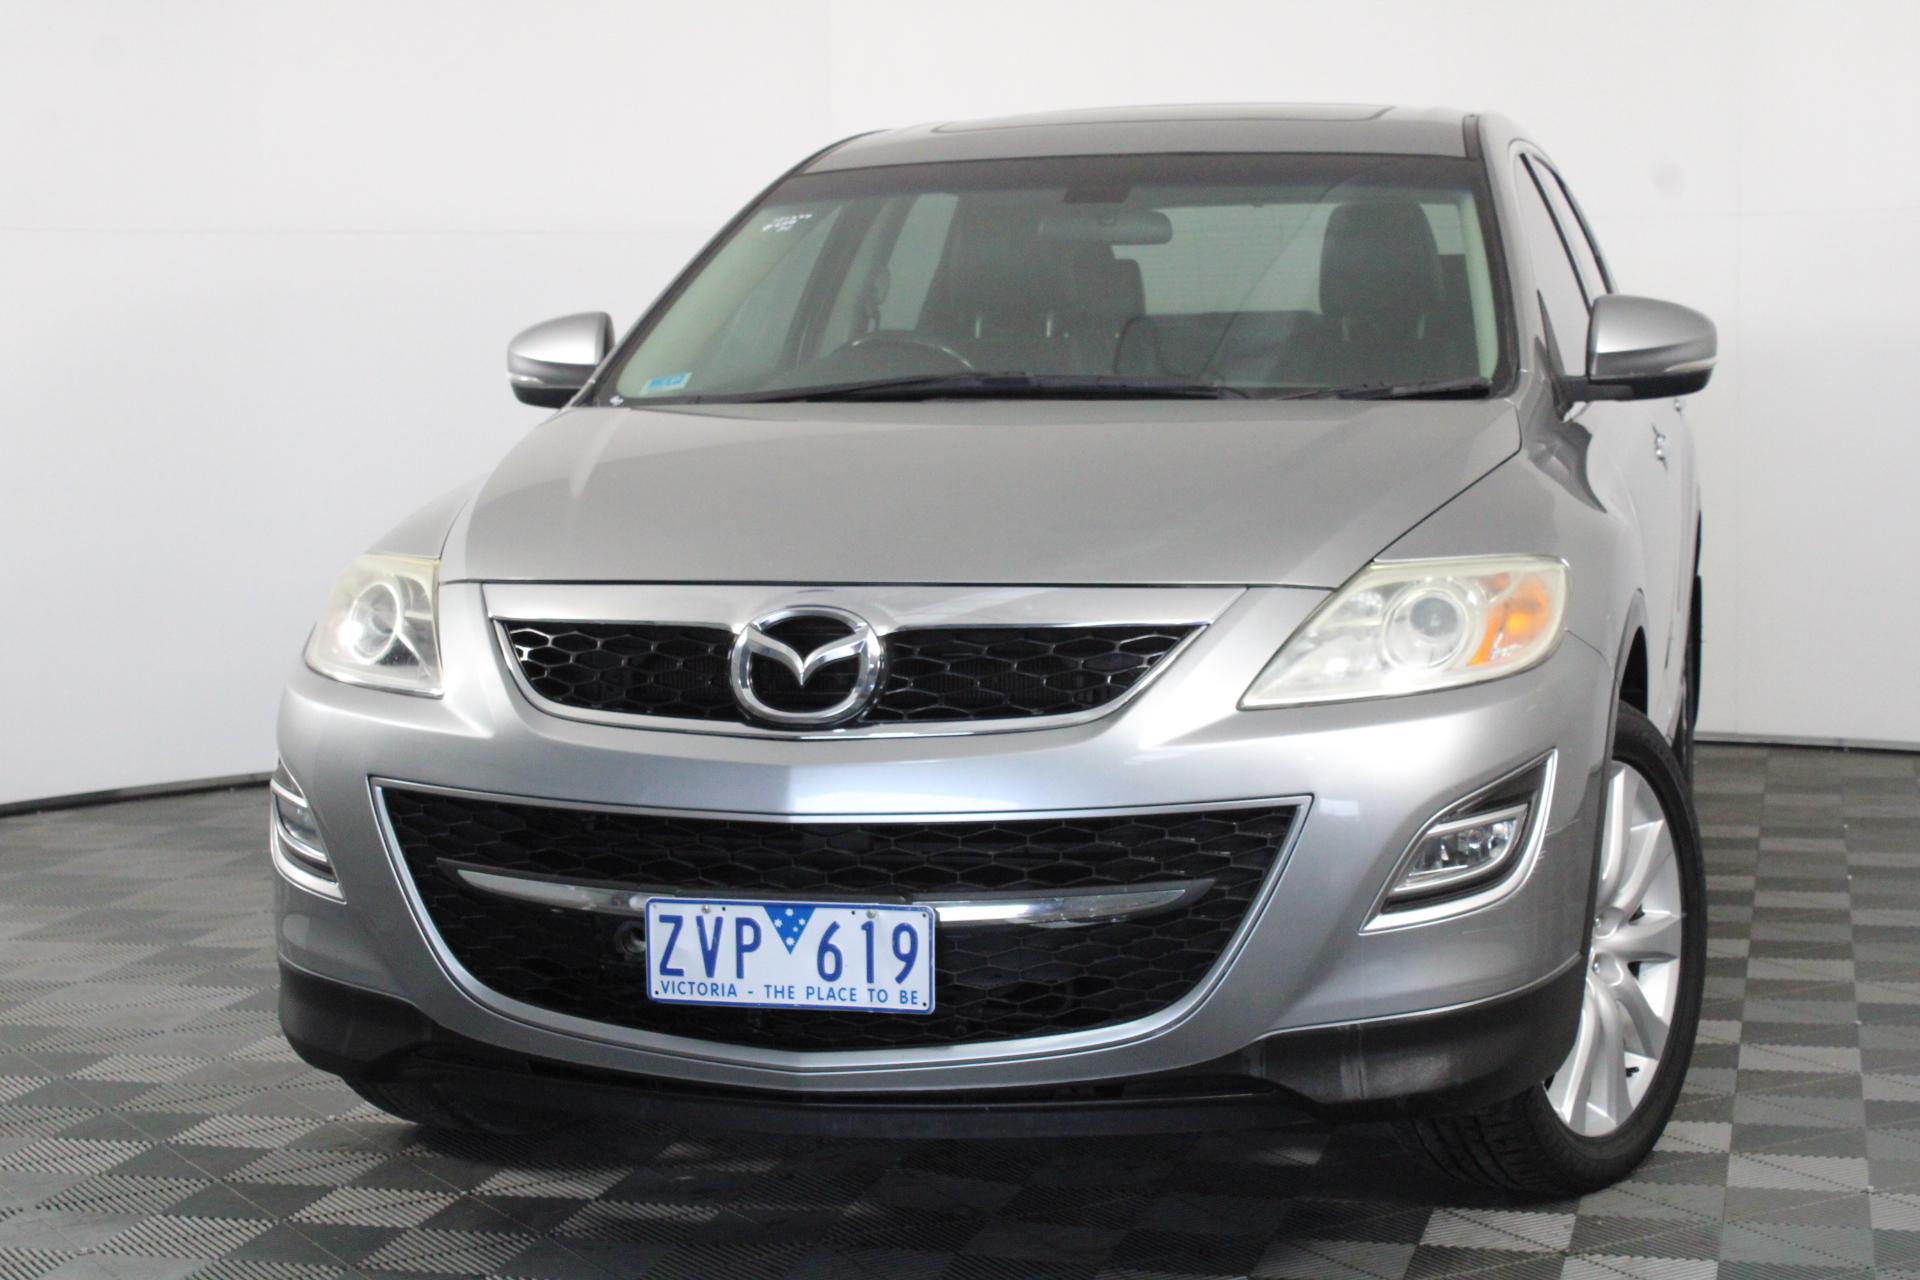 2010 Mazda CX-9 Luxury Automatic 7 Seats Wagon